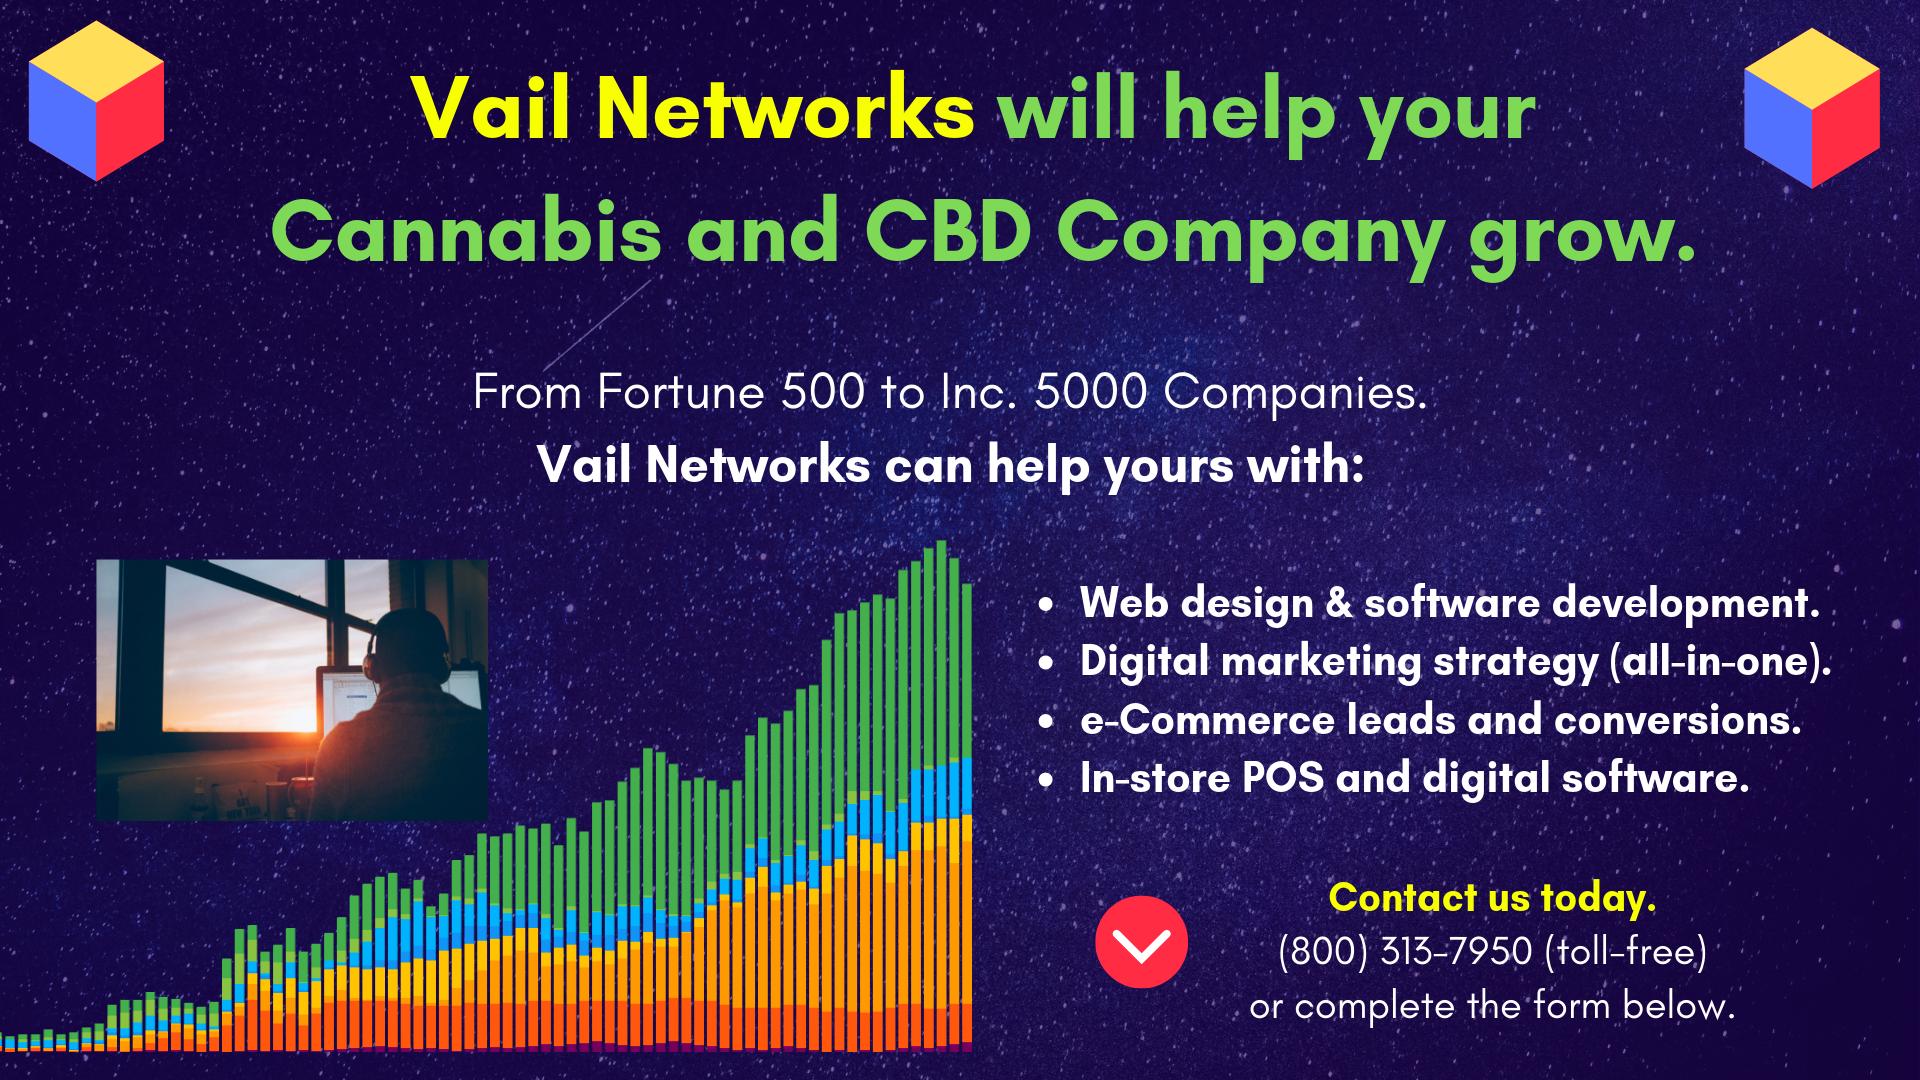 Company to Help with CBD and Cannabis Digital Marketing, SEO, and website design/development: vailnetworks.com